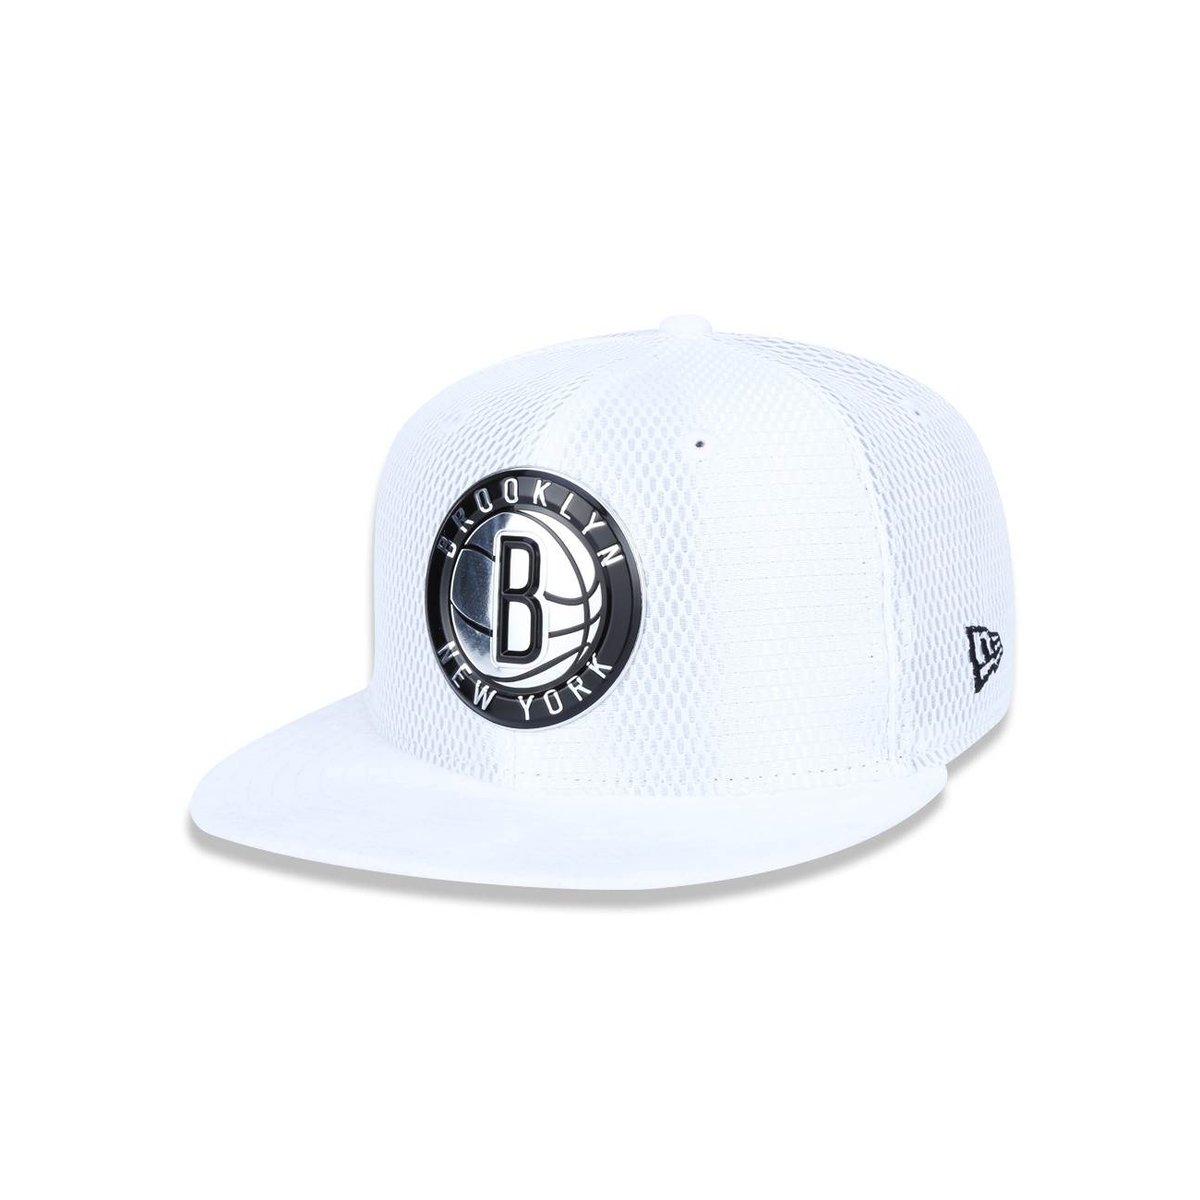 Bone 950 New Era Brooklyn Nets NBA Aba Reta Snapback - Branco ... f6dc31b8ec6